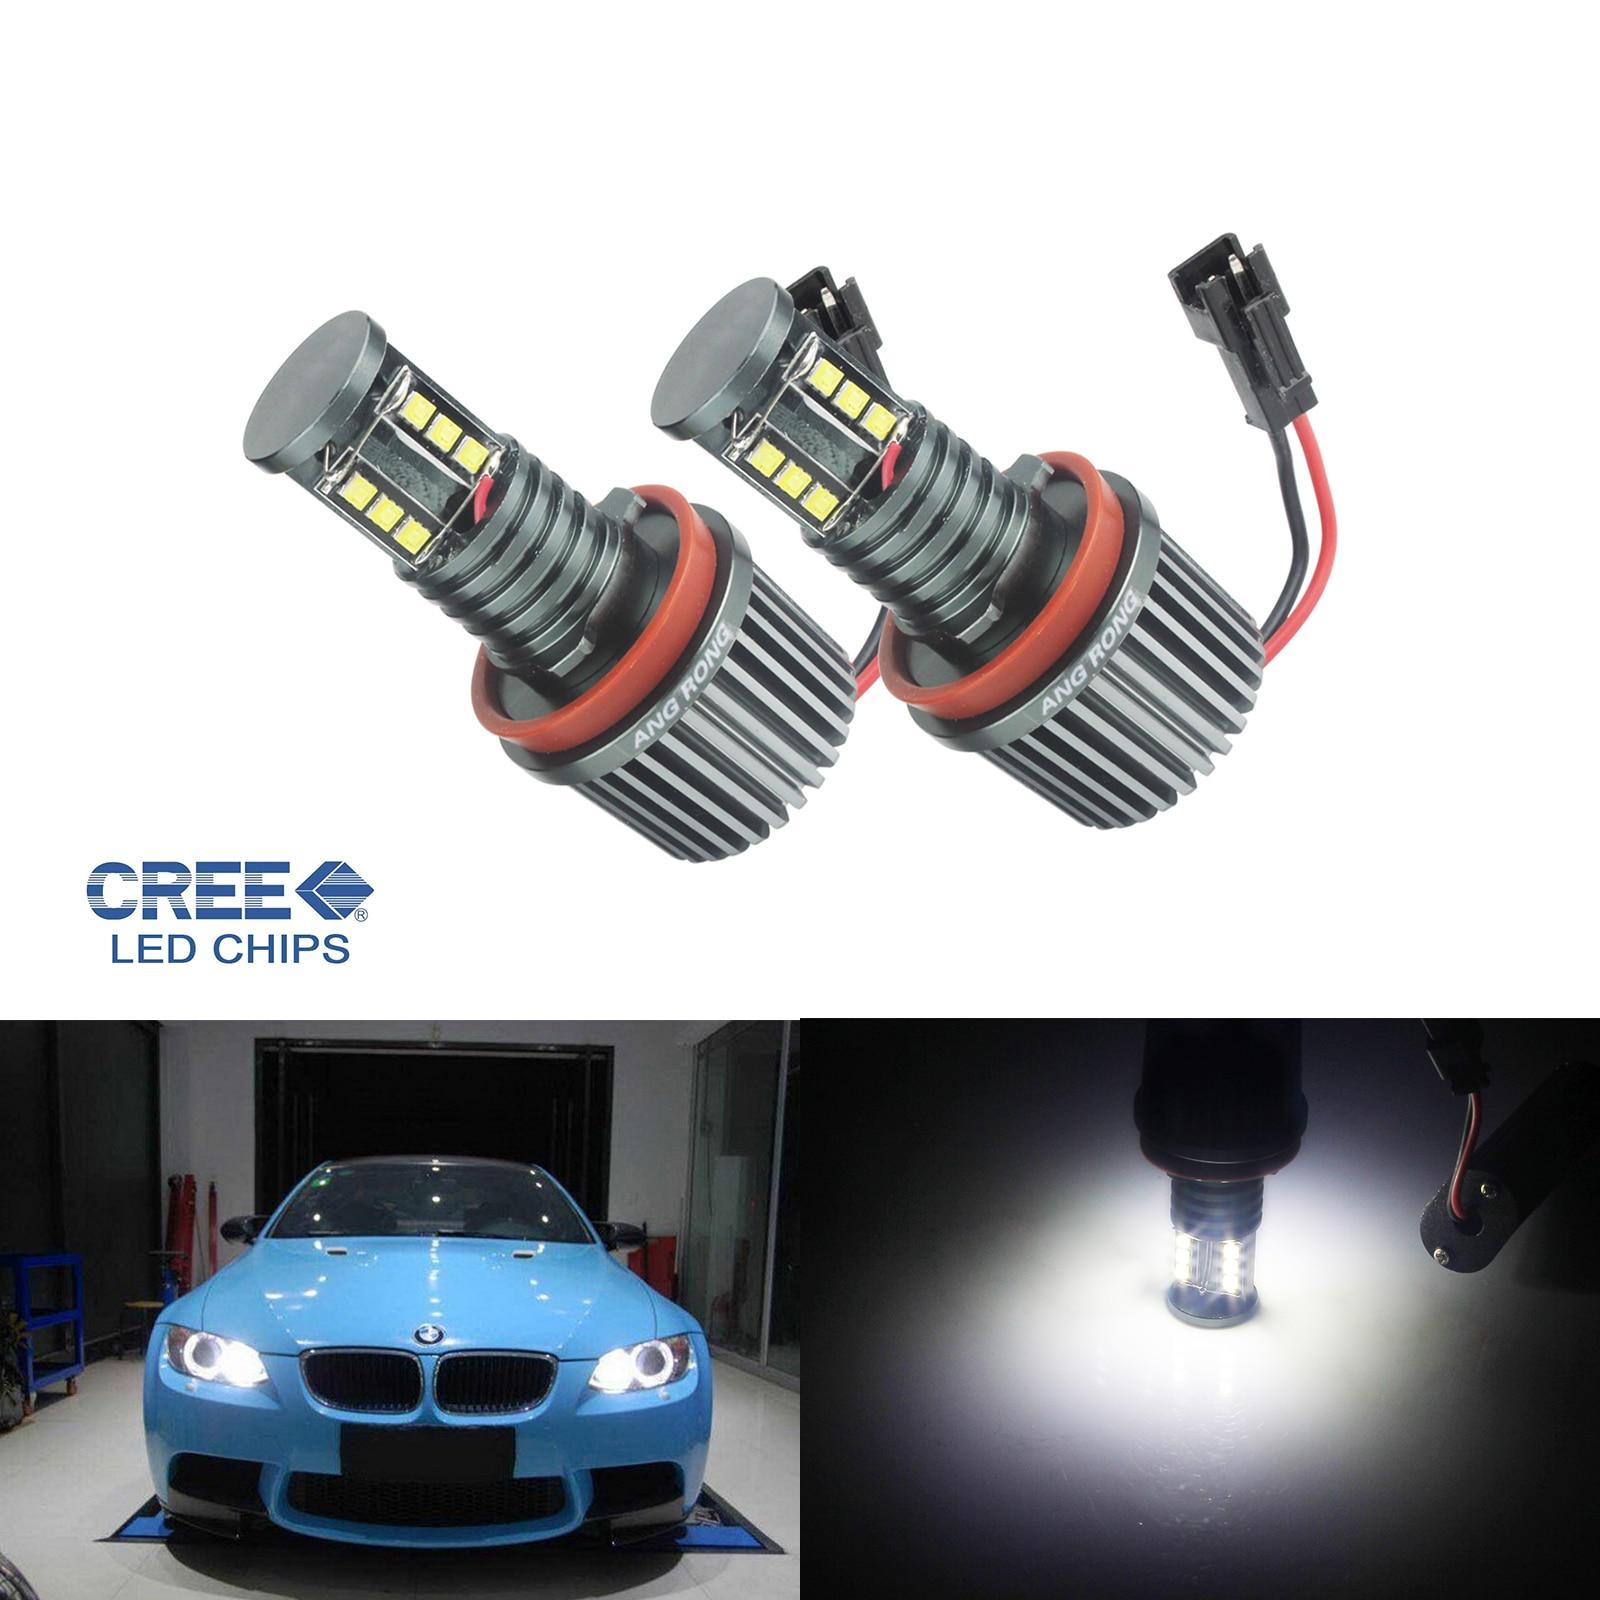 BMW CREE LED 60W Angel Eyes Halo Light H8 Bulb E84 E61 E70 X5 E71 E92 X6 E89 Z4